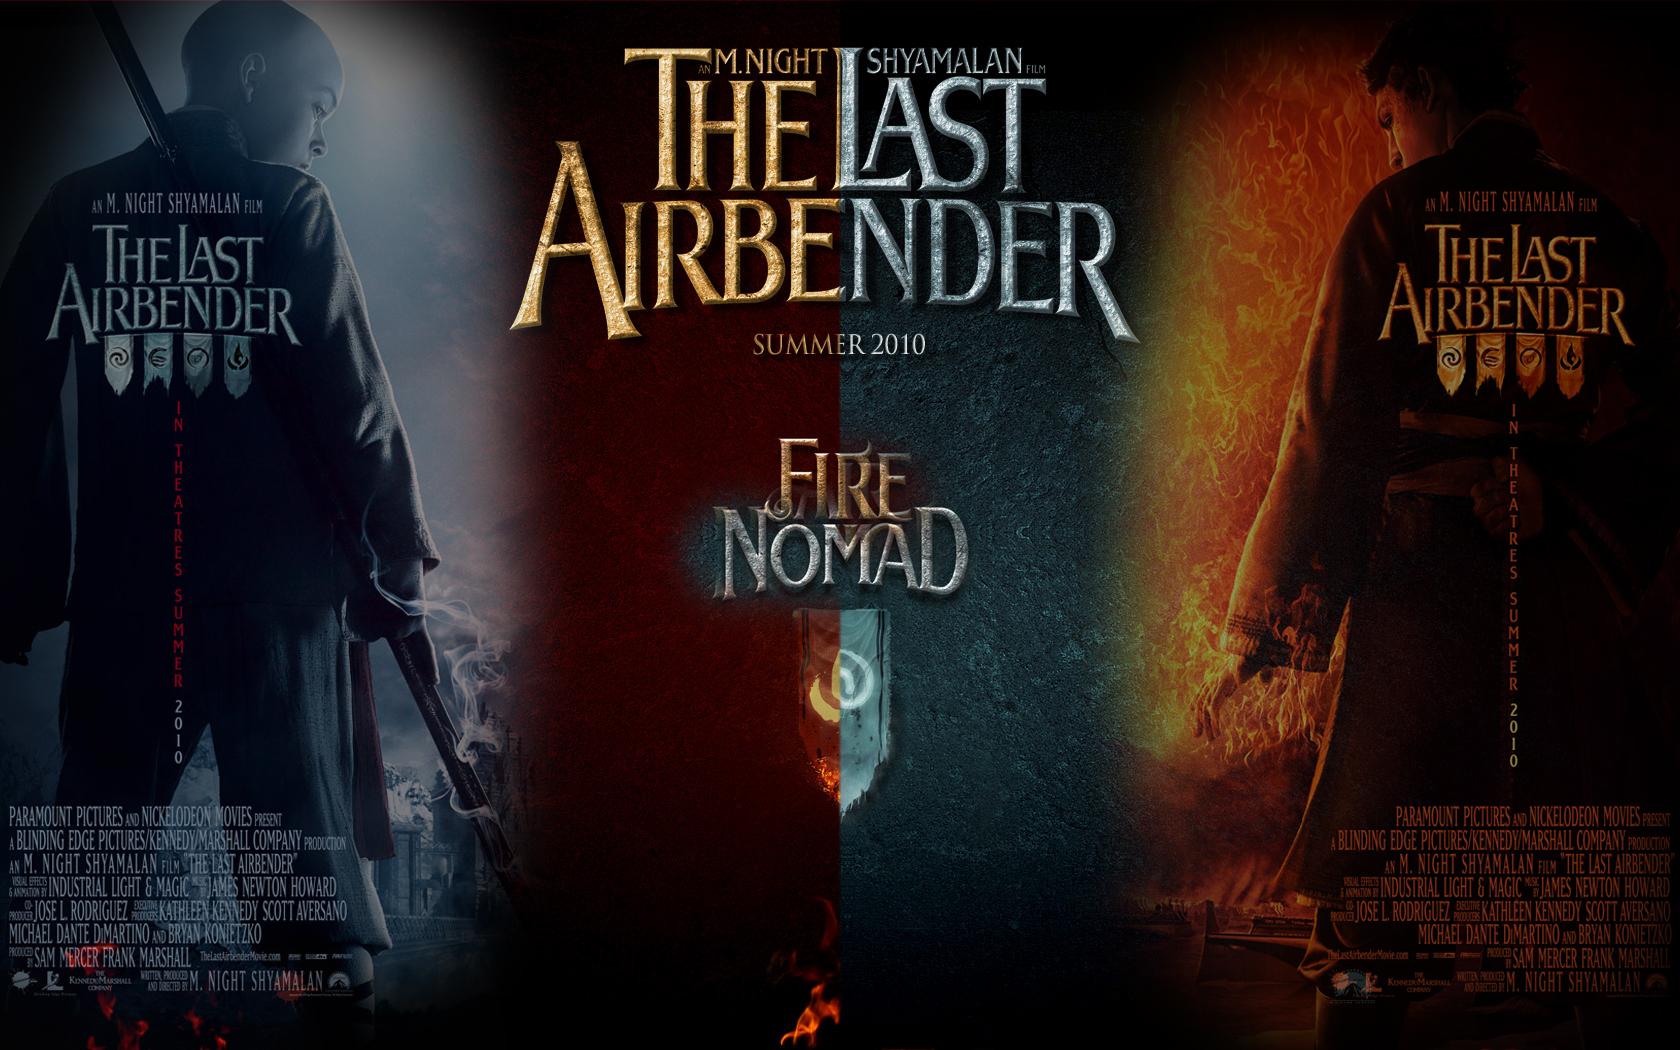 Avatar The Last Airbender Movie 2 15 Cool Hd Wallpaper ...  Avatar The Last Airbender 2 Movie